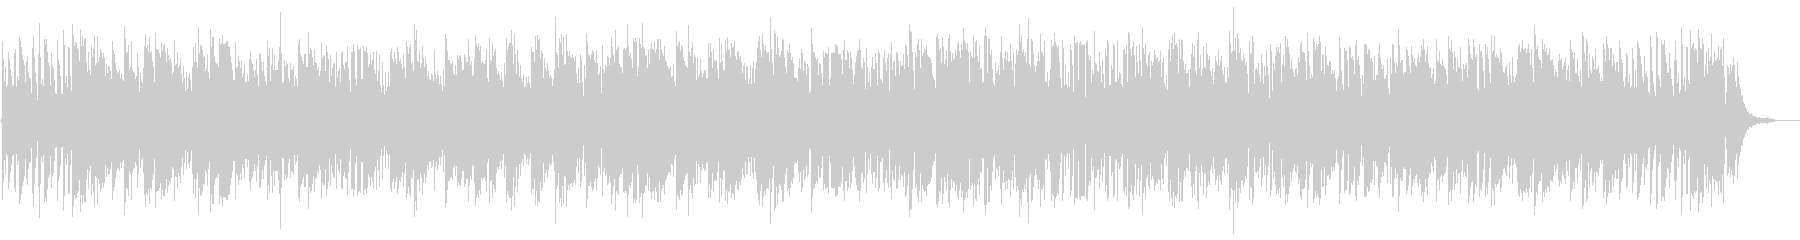 Piano Sonata 8th 2nd movement Jazz's unreproduced waveform